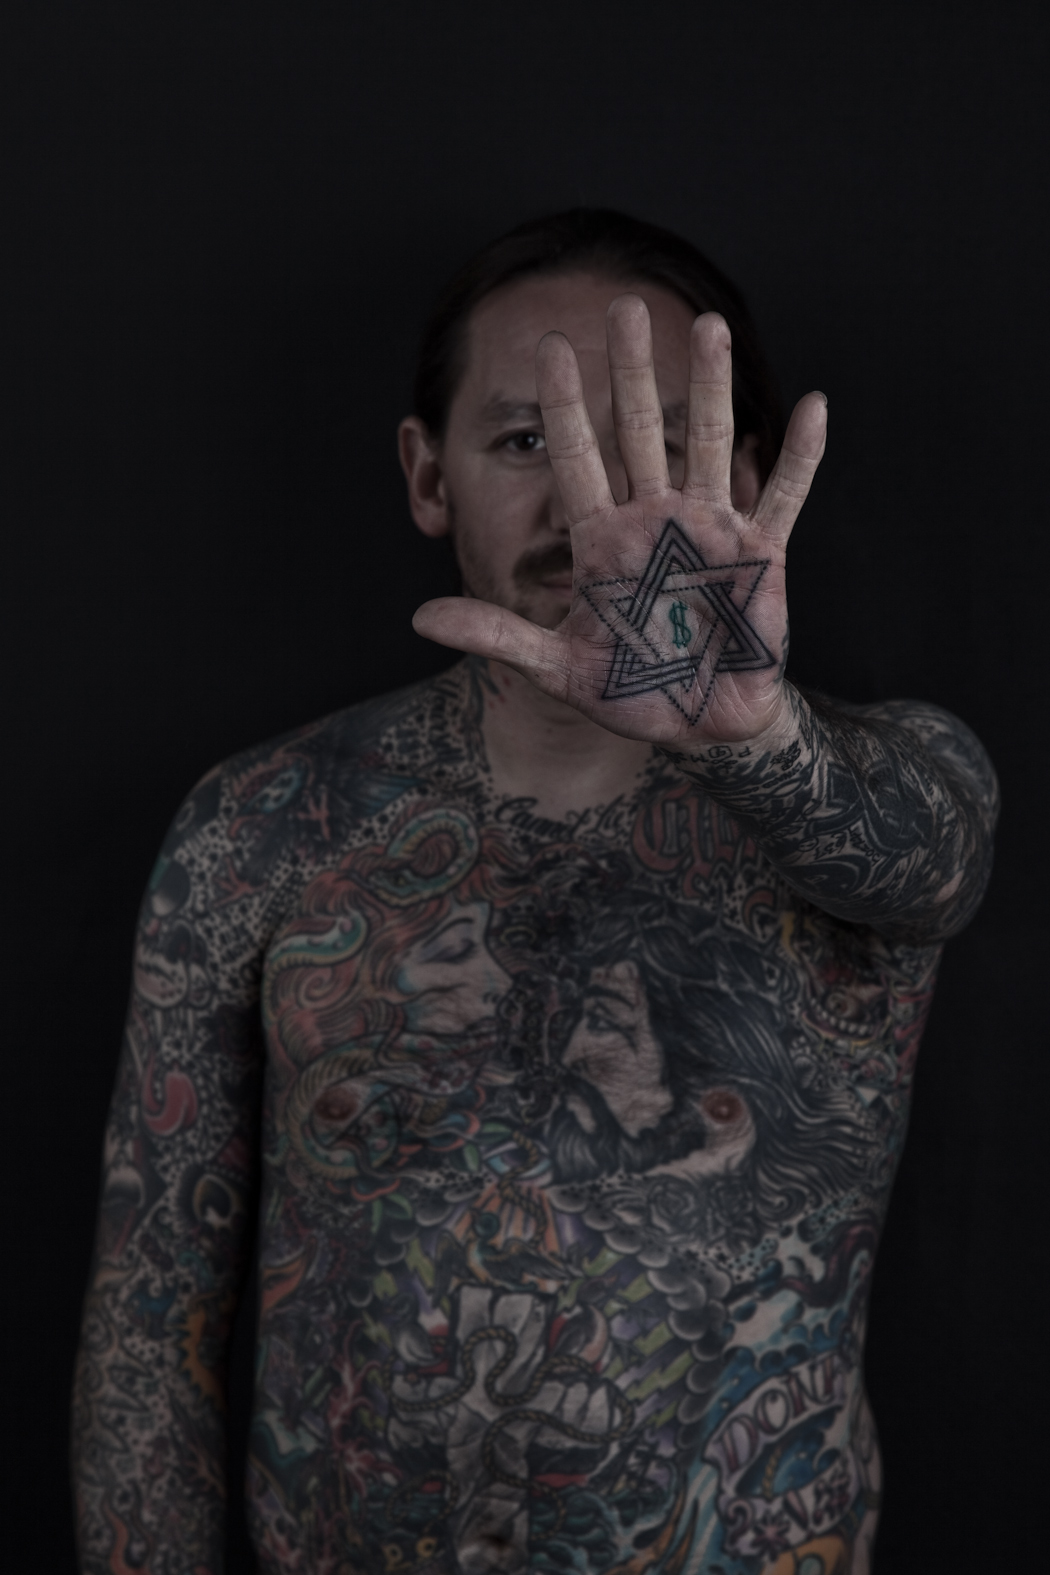 Oliver Peck Tattoos